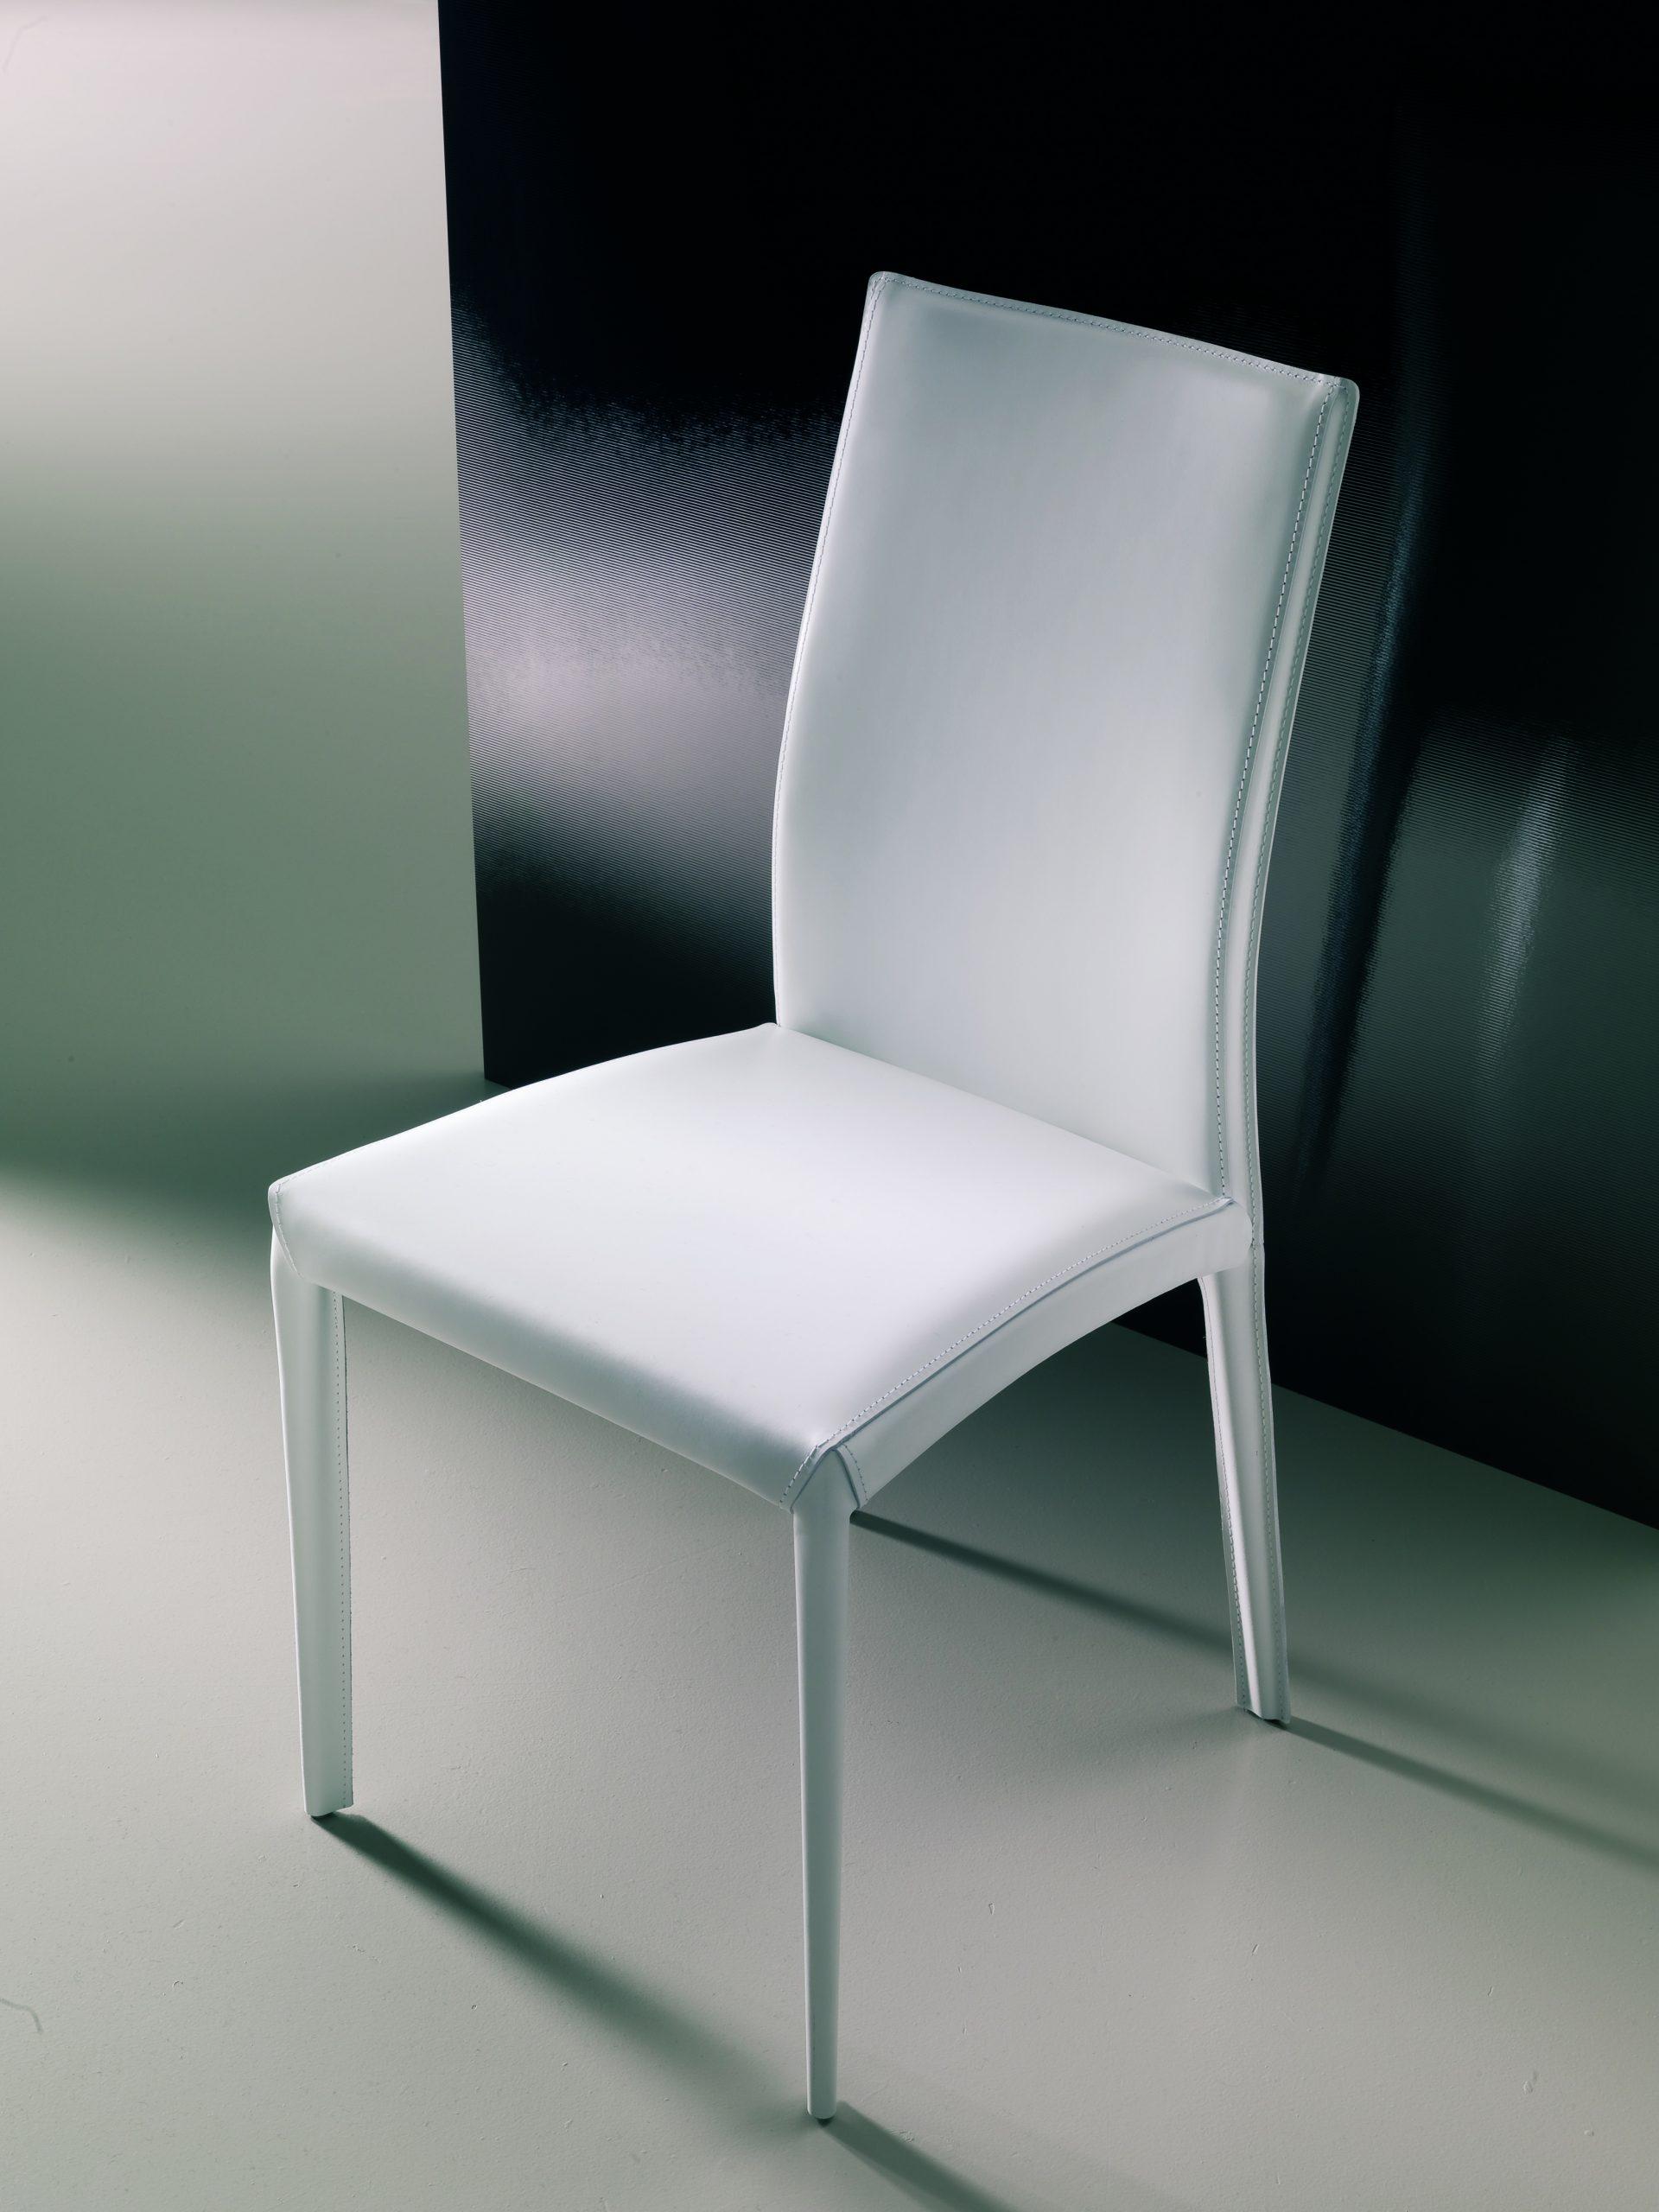 Kefir Dining Chairs